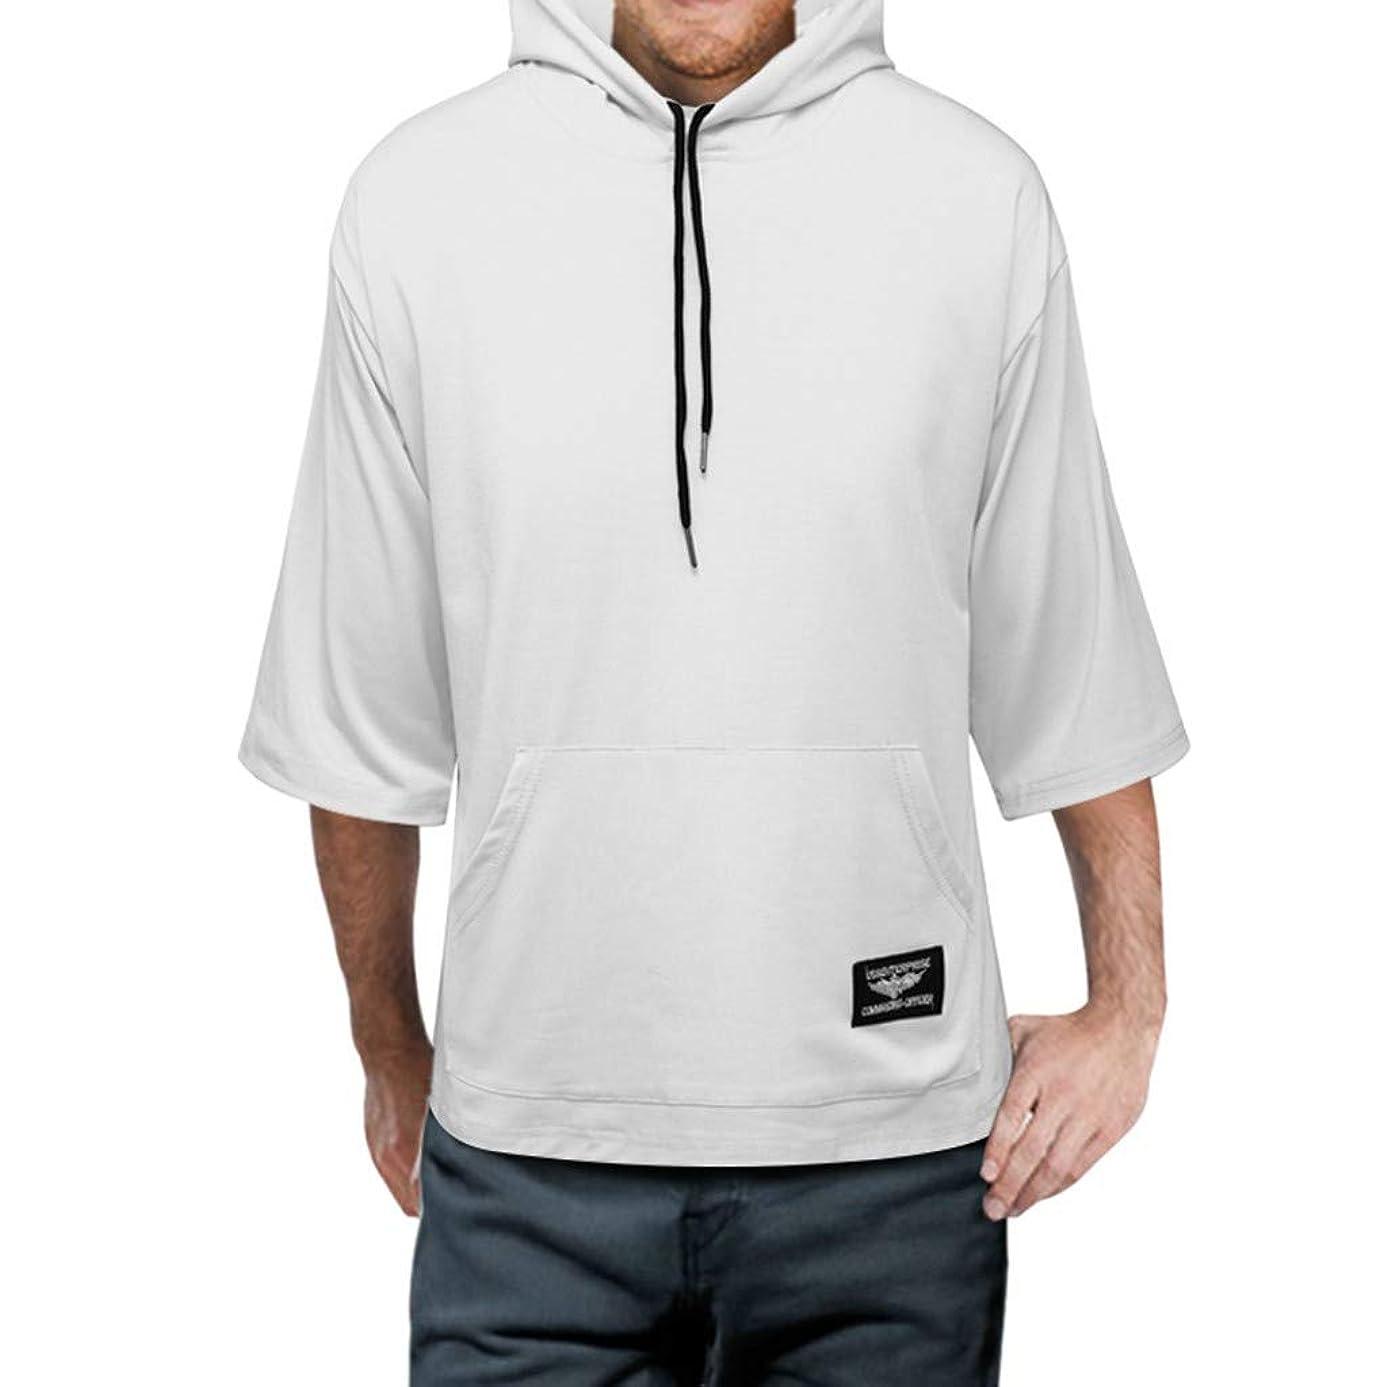 MIS1950s Mens Hipster Hip Hop Short/Long Sleeve Longline Pullover Hoodies Shirts Elong Longline Hoodie